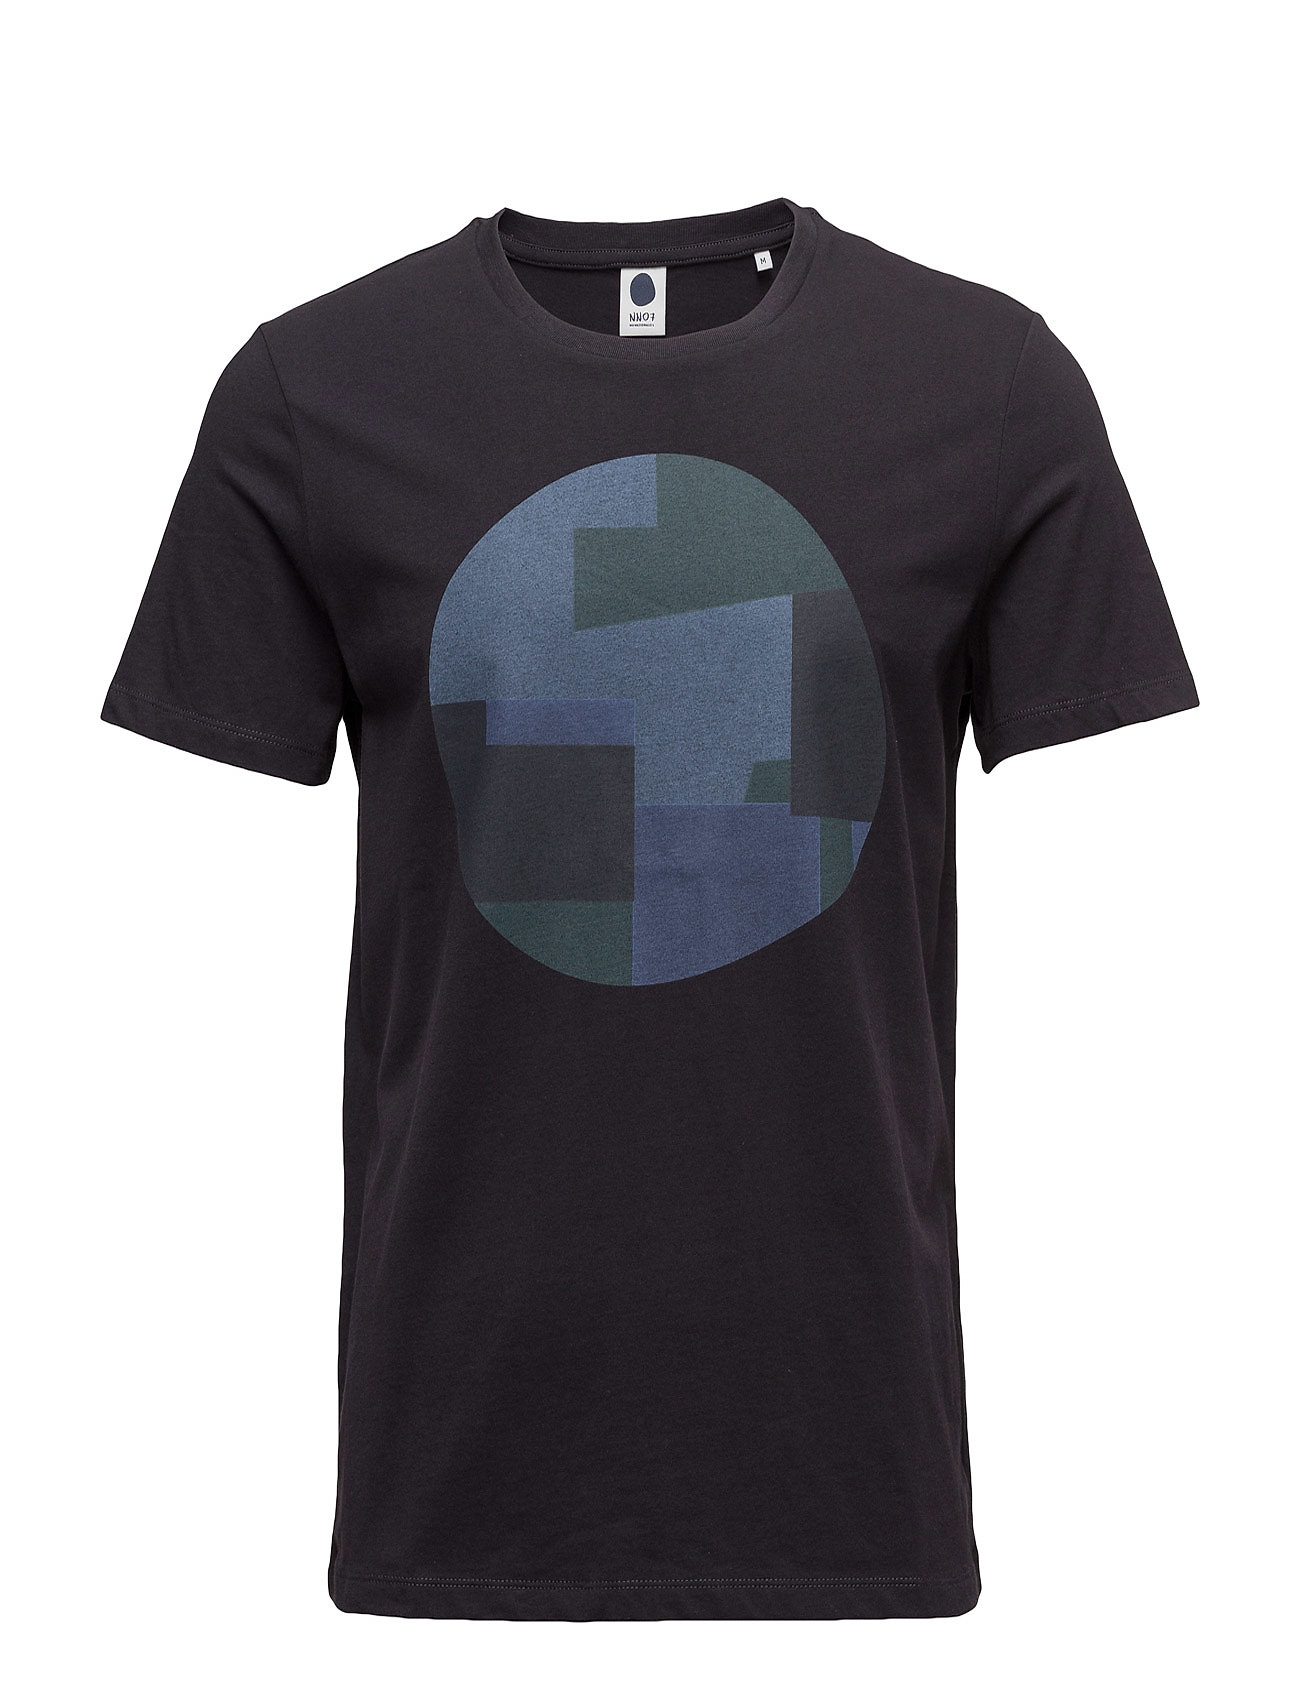 Barry Tee 3292 NN07 T-shirts til Mænd i Marine blå